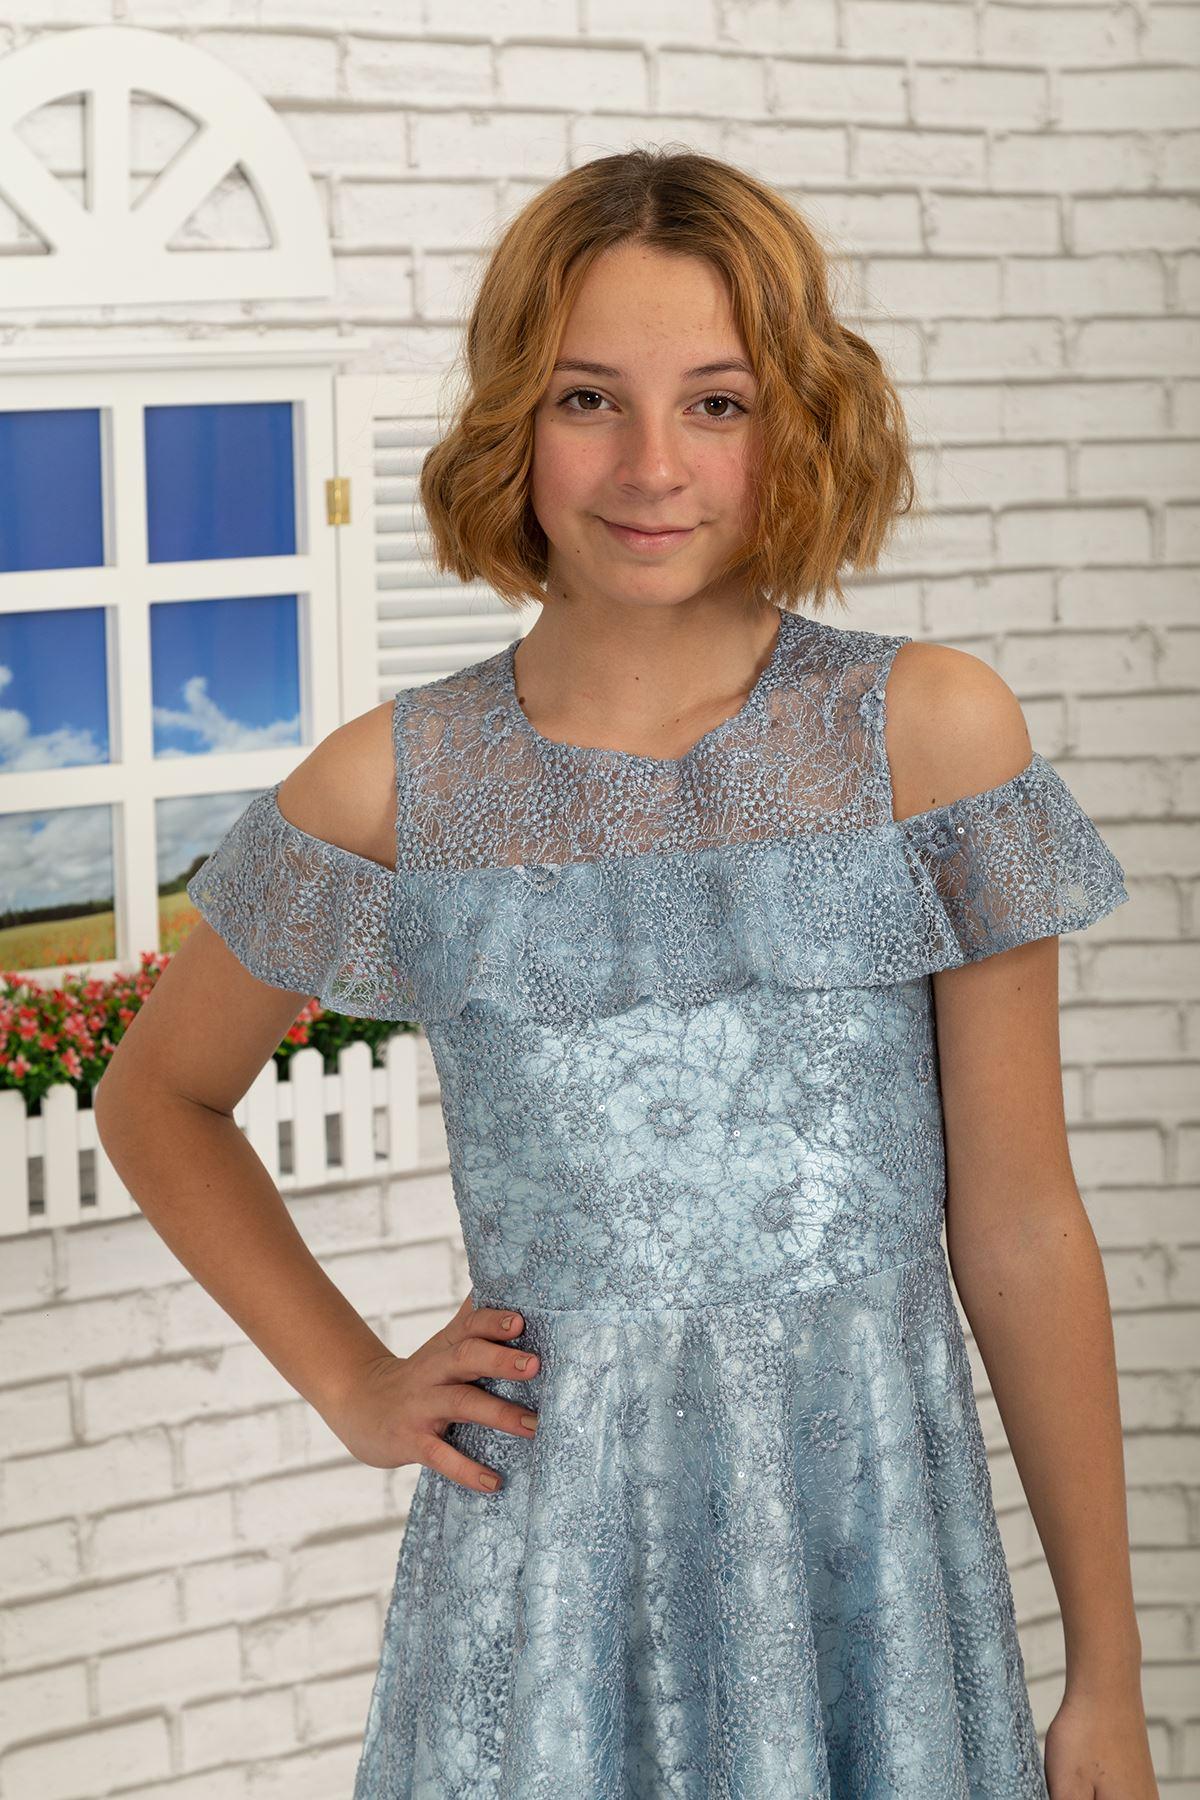 Shoulder Detail, Lace Short Girls Evening Dress 495 Indigo